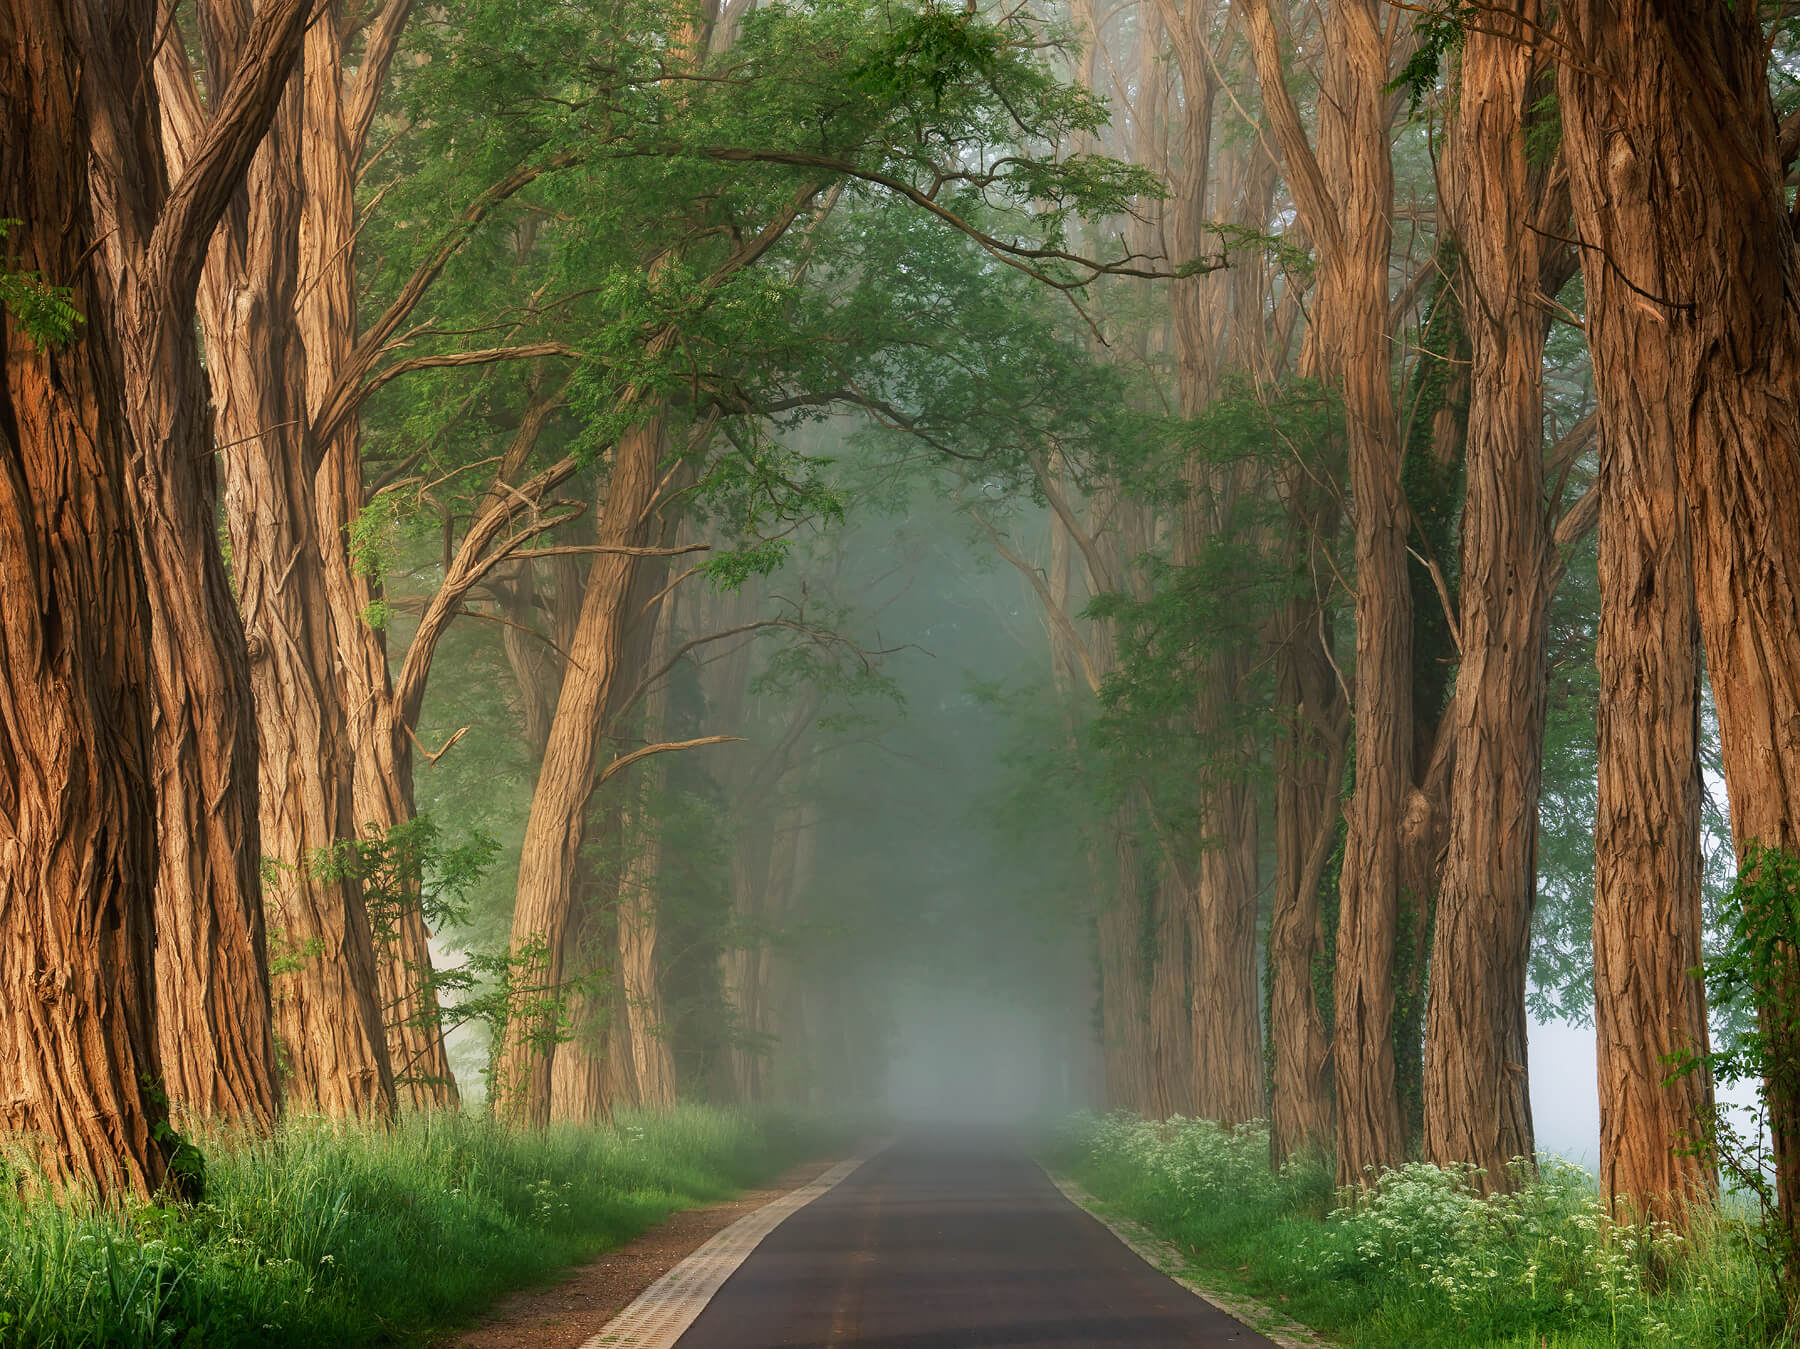 Acacias in the Mist